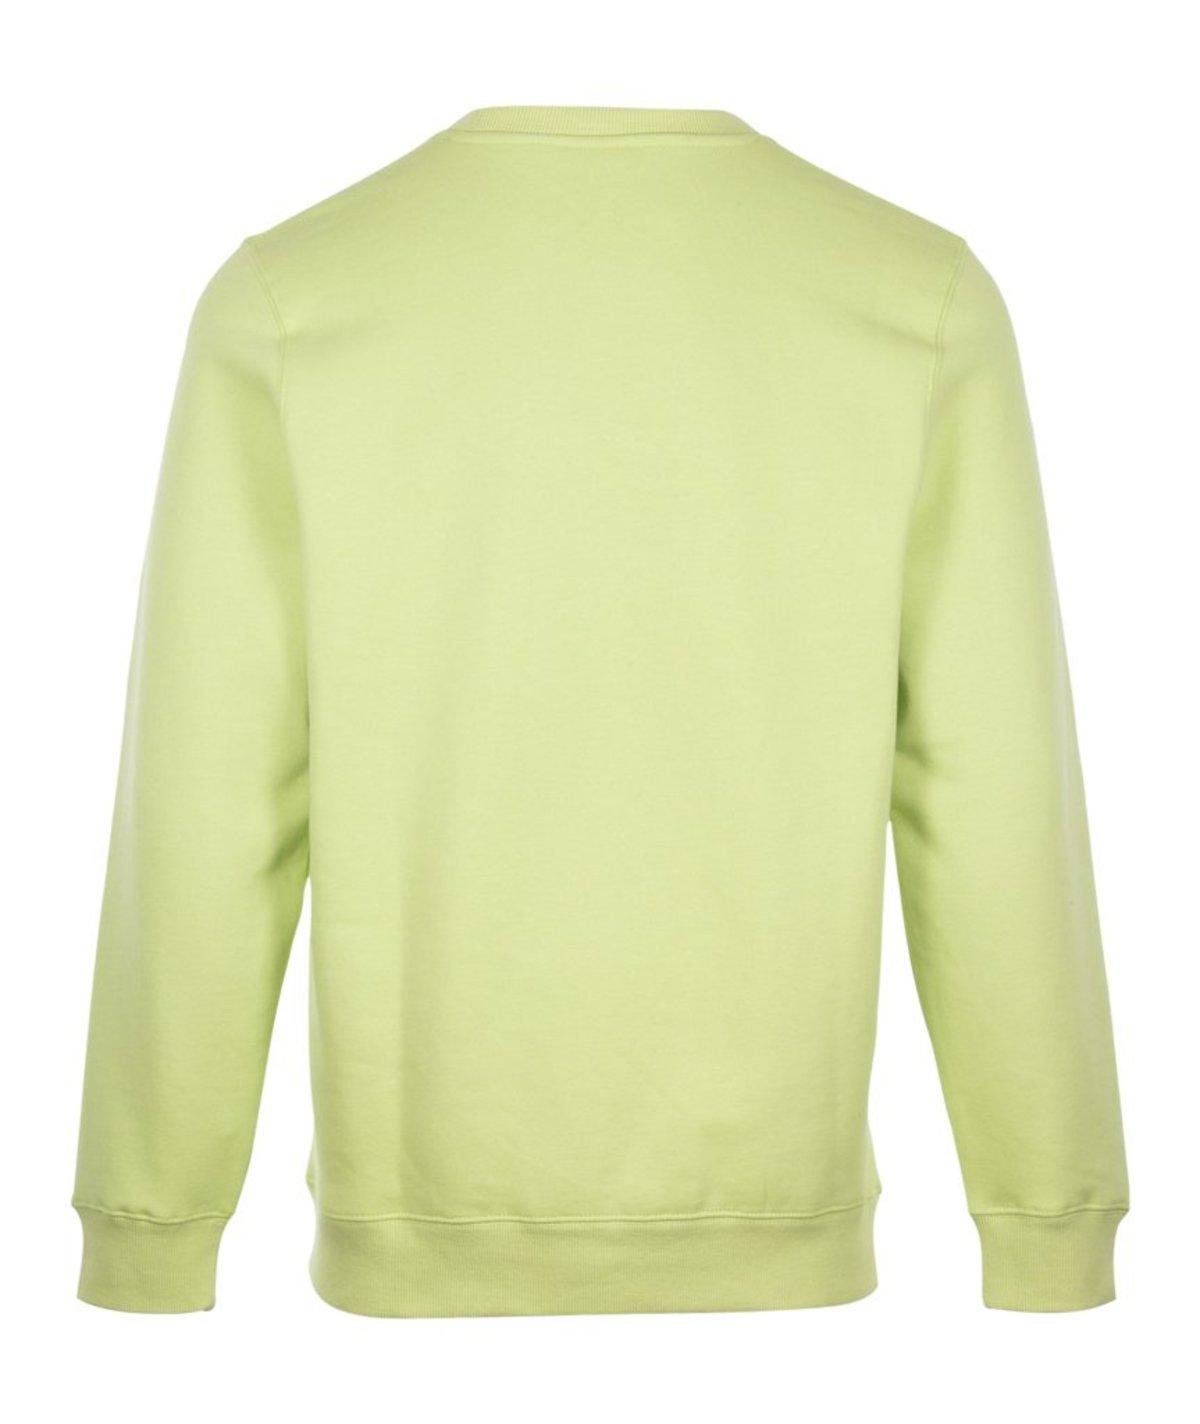 ad98b6959f Stussy Weld Applique Crew Sweatshirt - Green